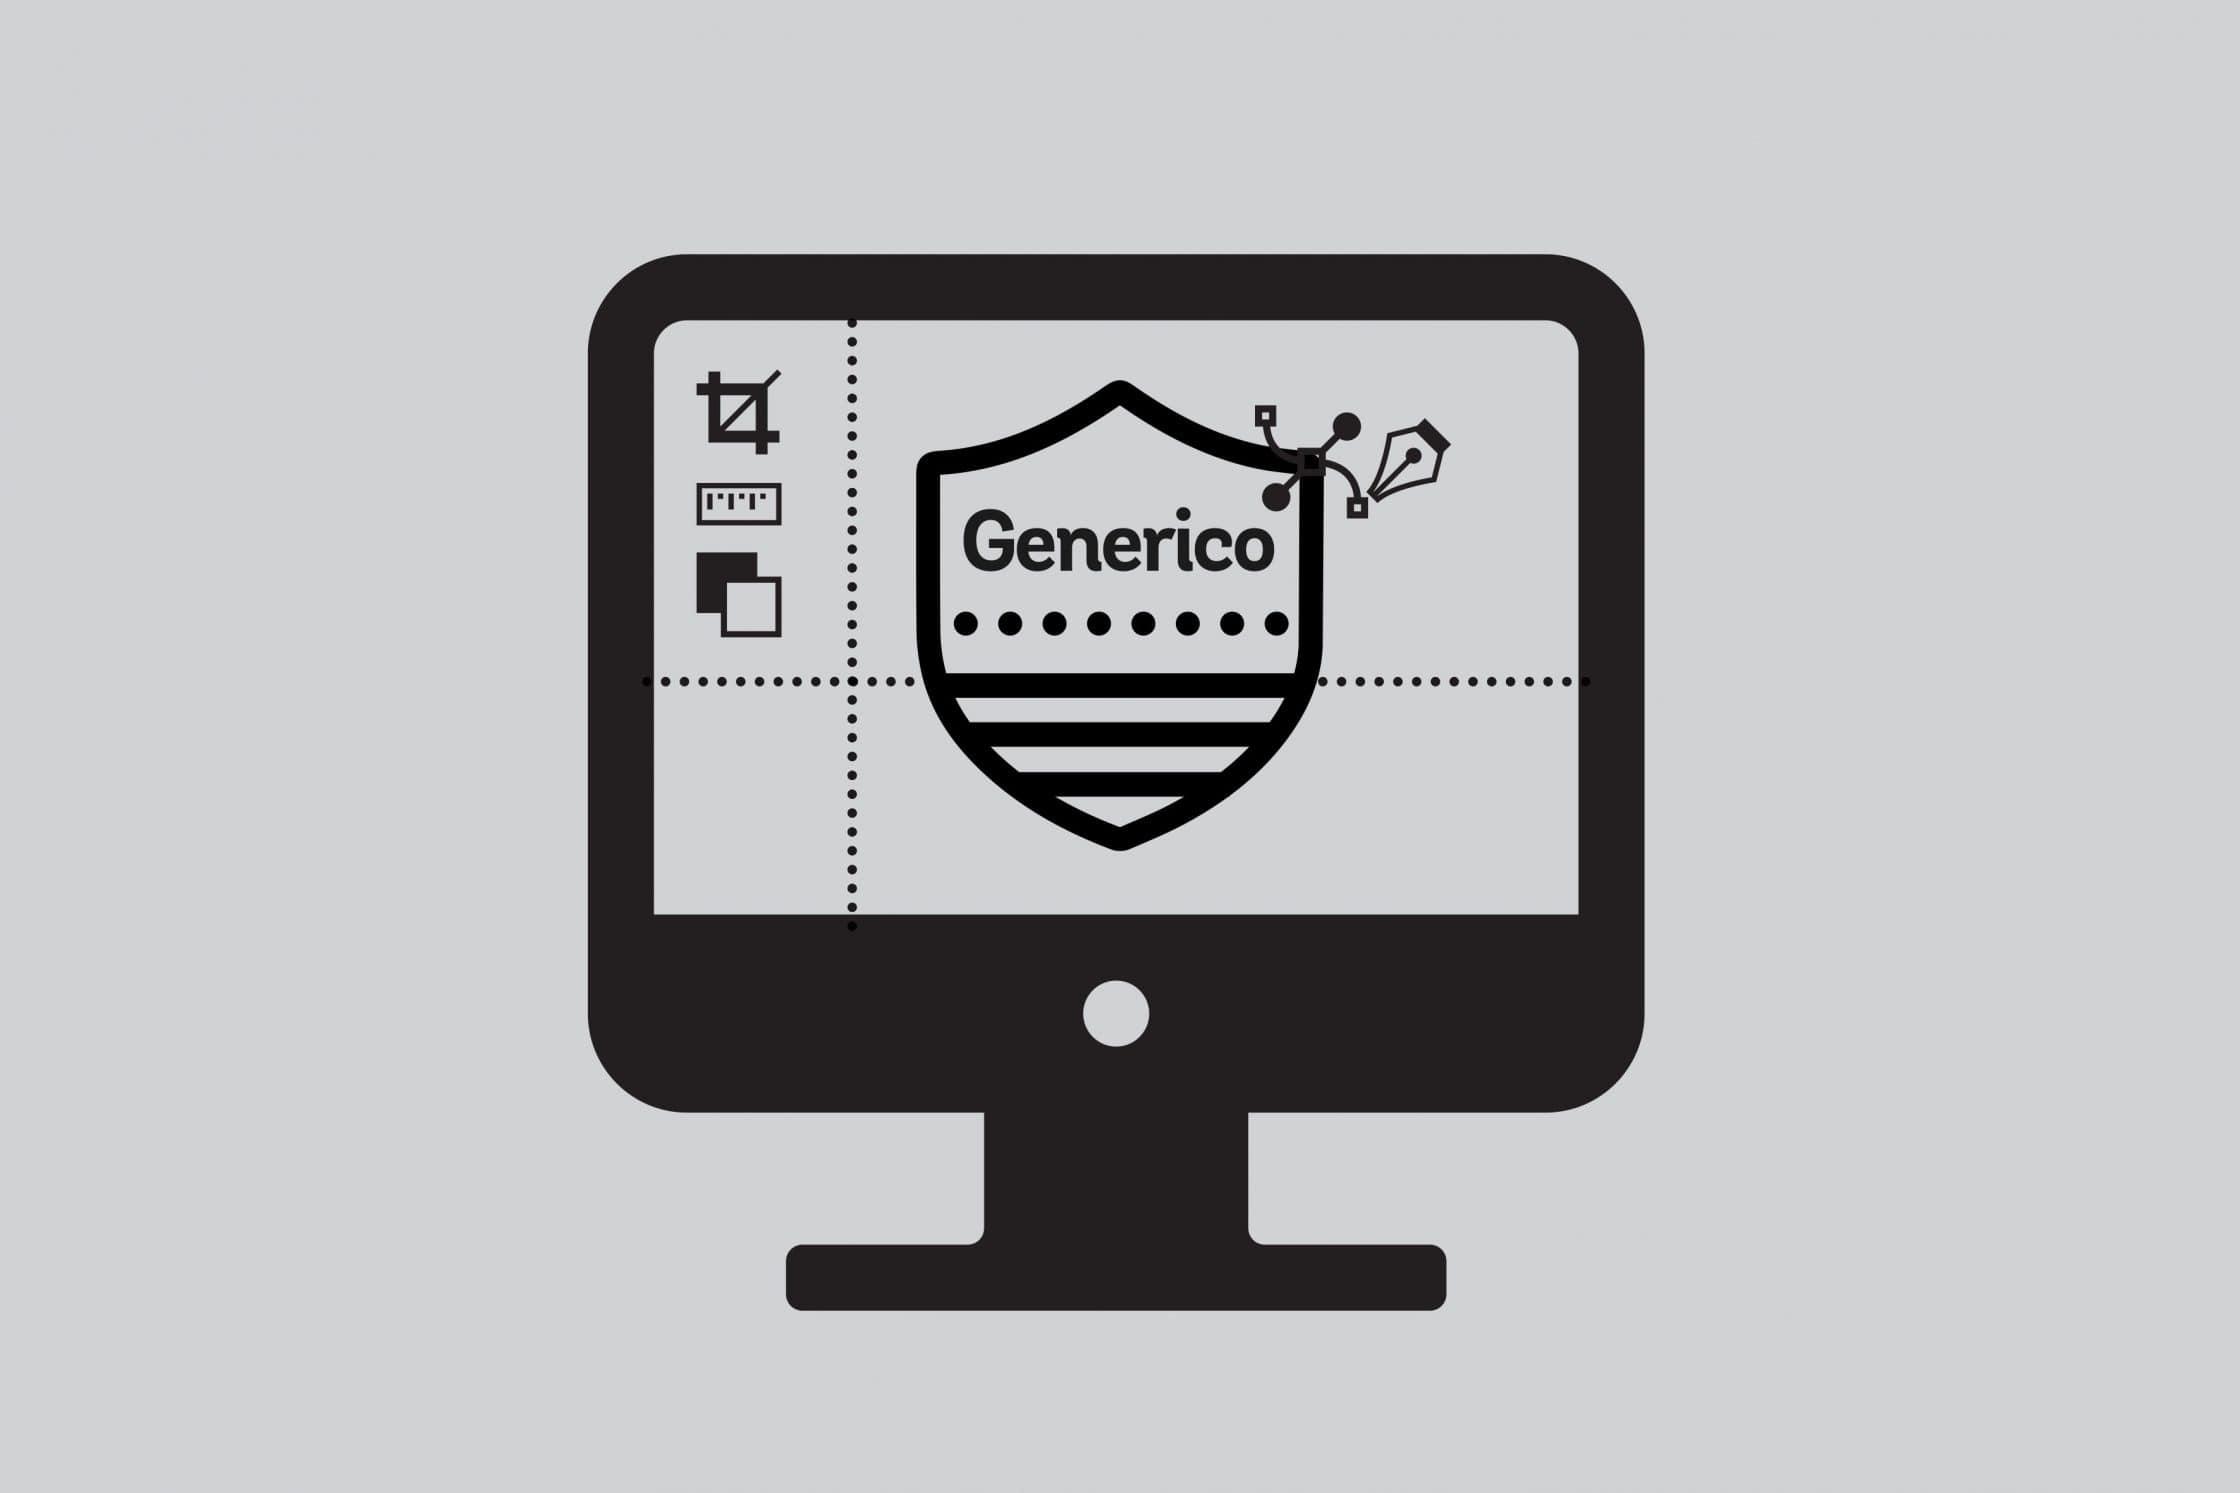 Generico logo in an image editor on computer screen.